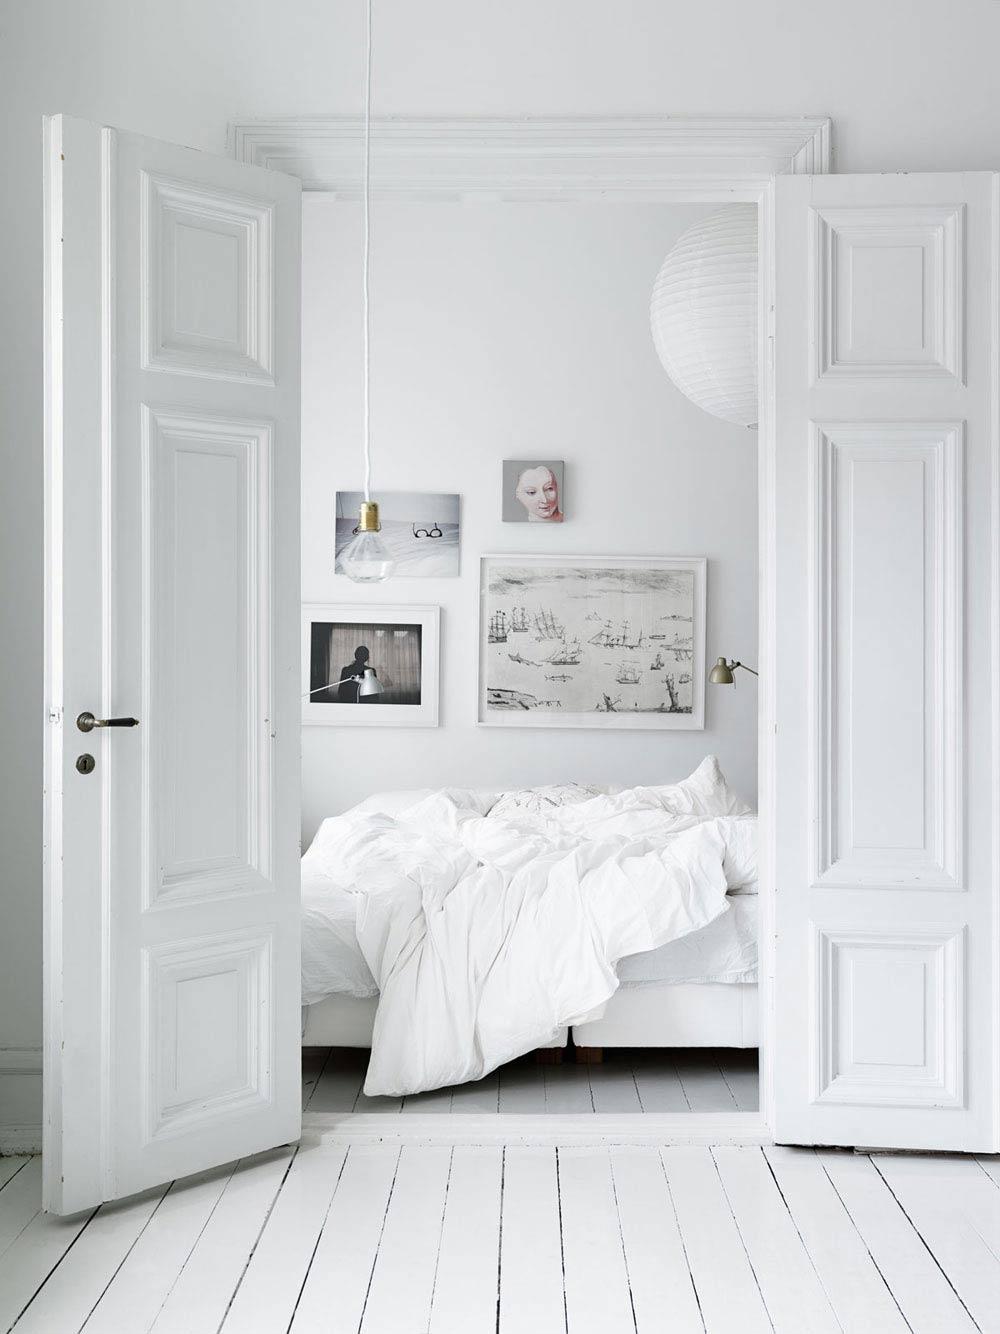 Oracle, Fox, Sunday, Sanctuary, White, Interior, White, Bedroom, Cosy, Bed